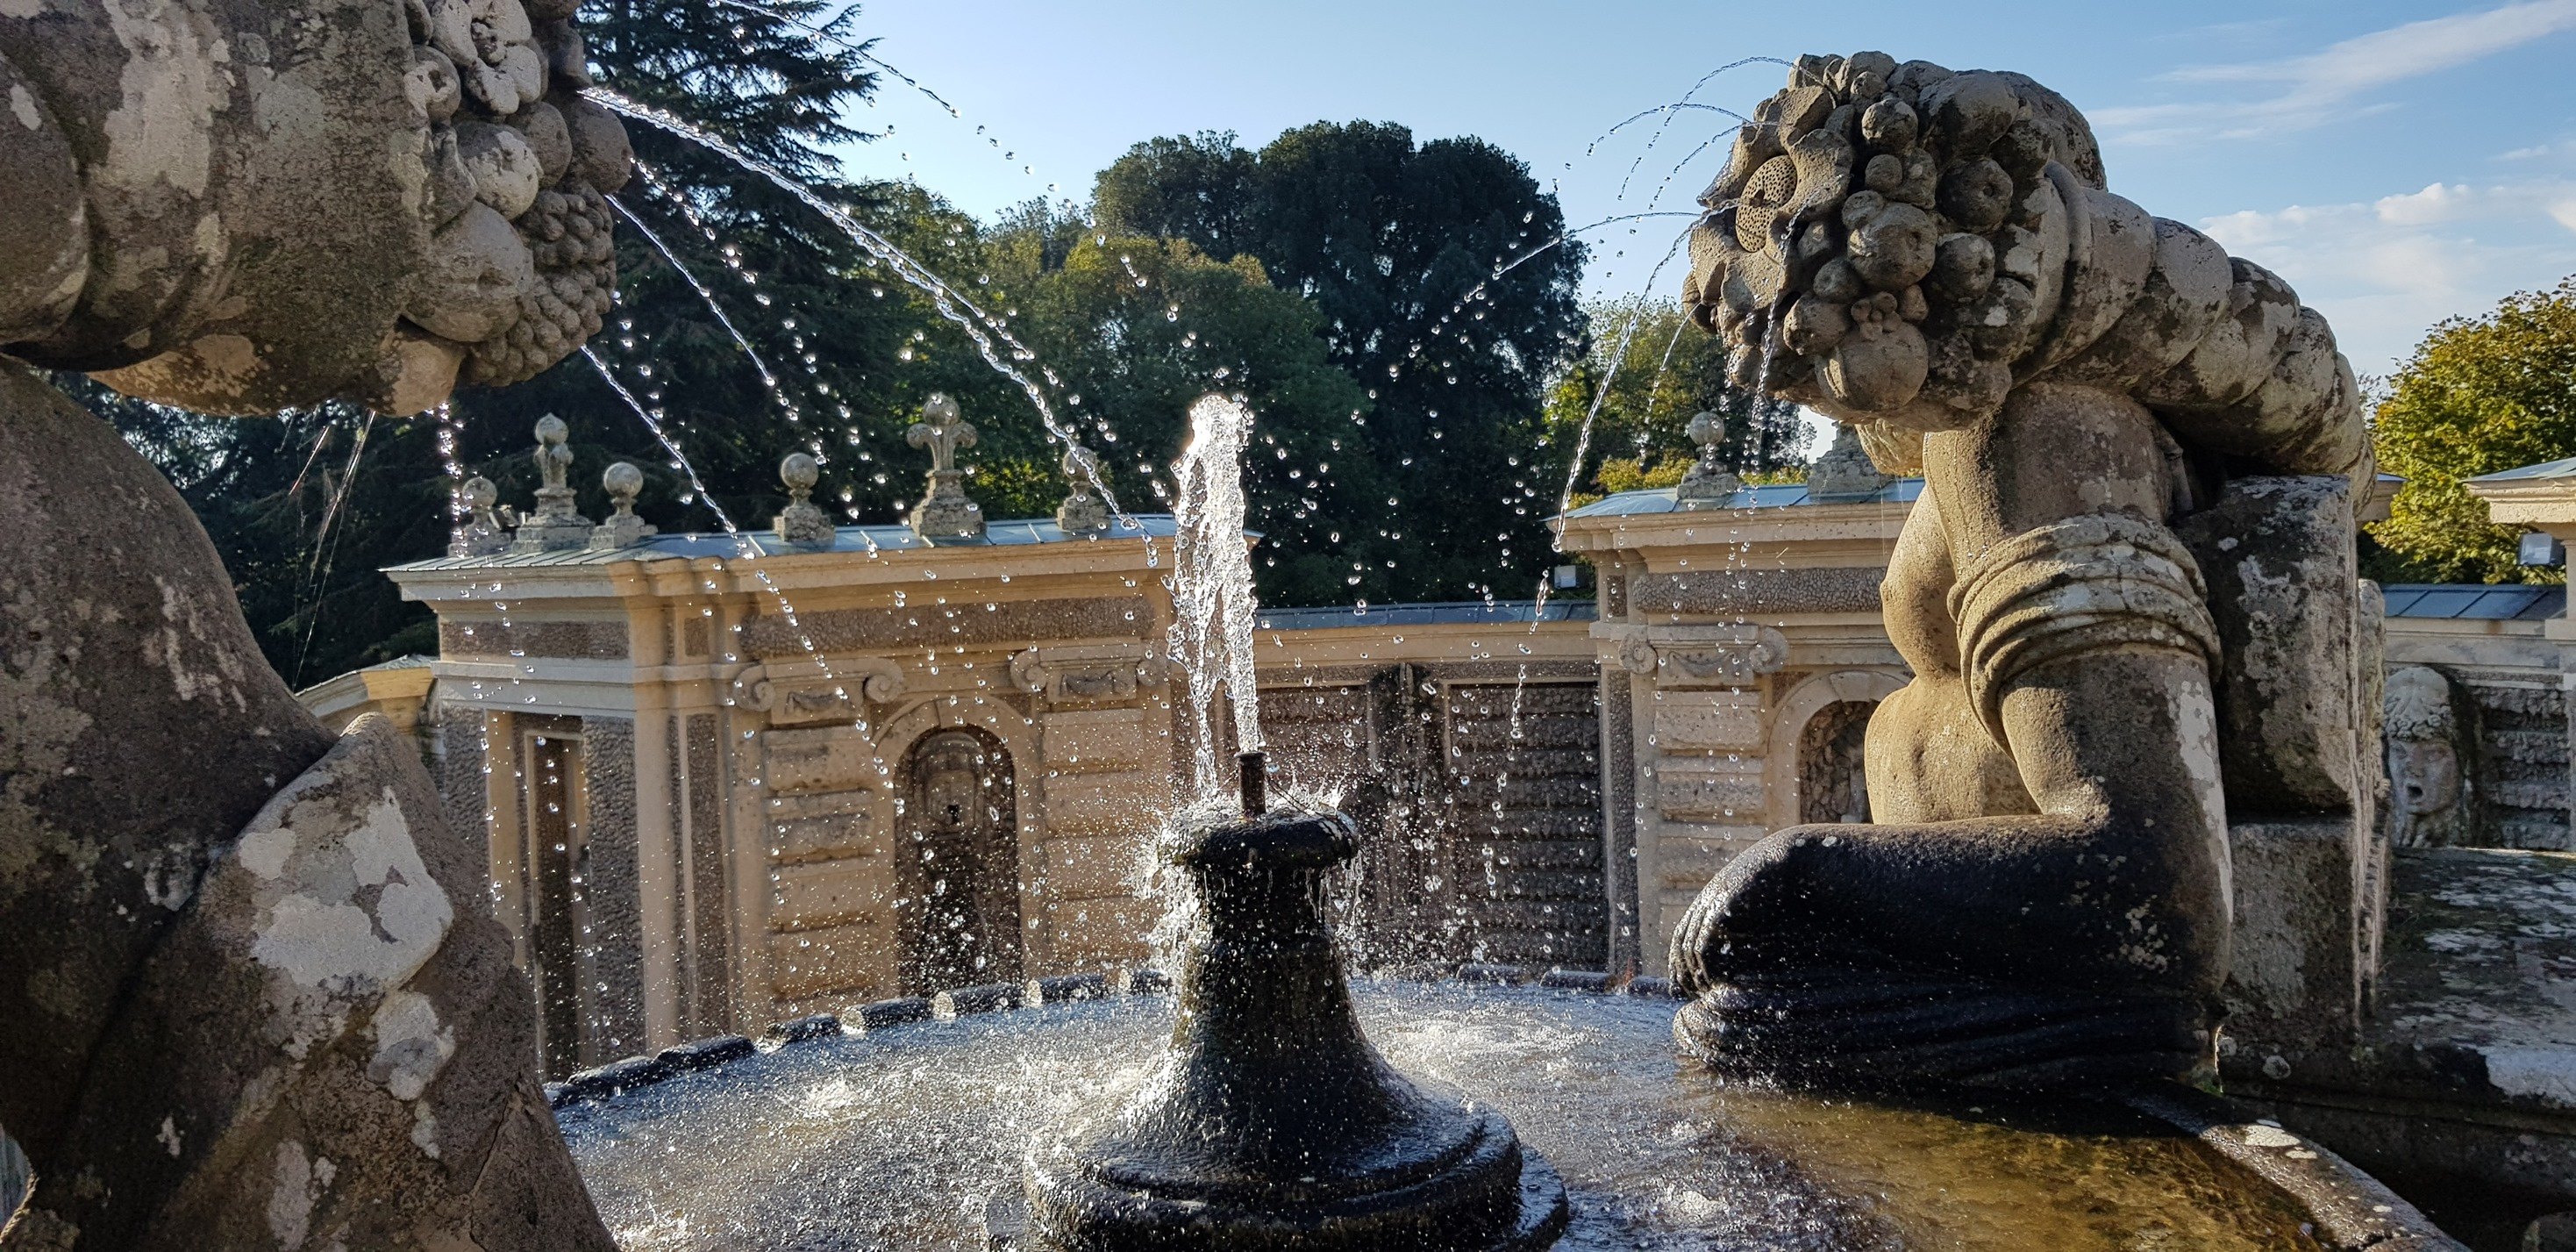 caprarola_palazzo-farnese_fontana_giochi-d-acqua_foto-PArCo